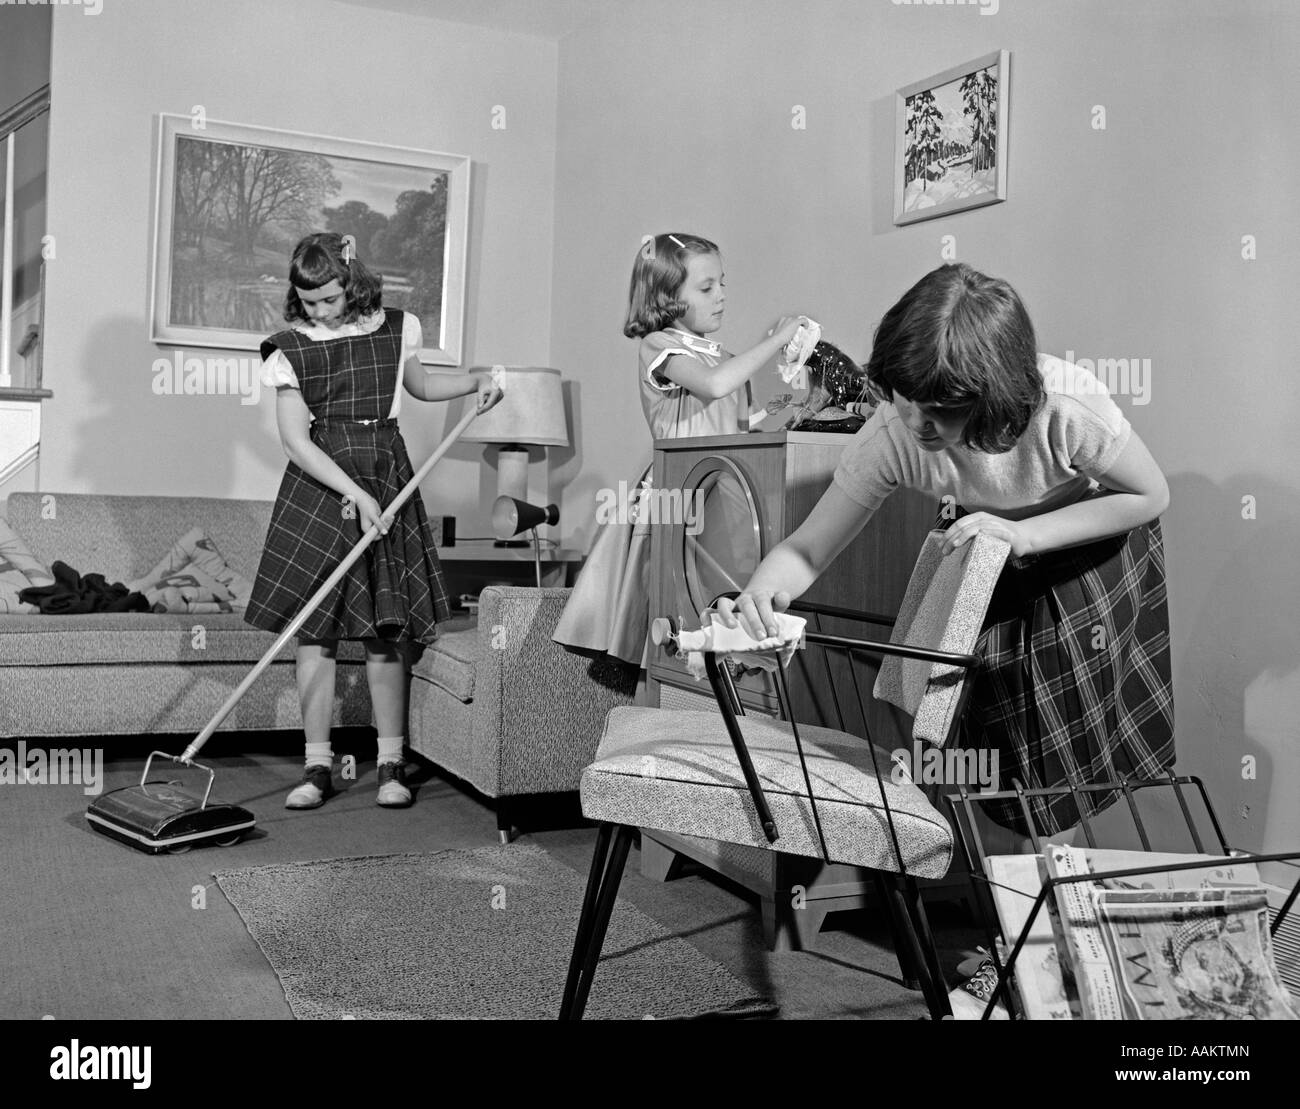 1950s Living Room Stockfotos & 1950s Living Room Bilder - Seite 3 ...